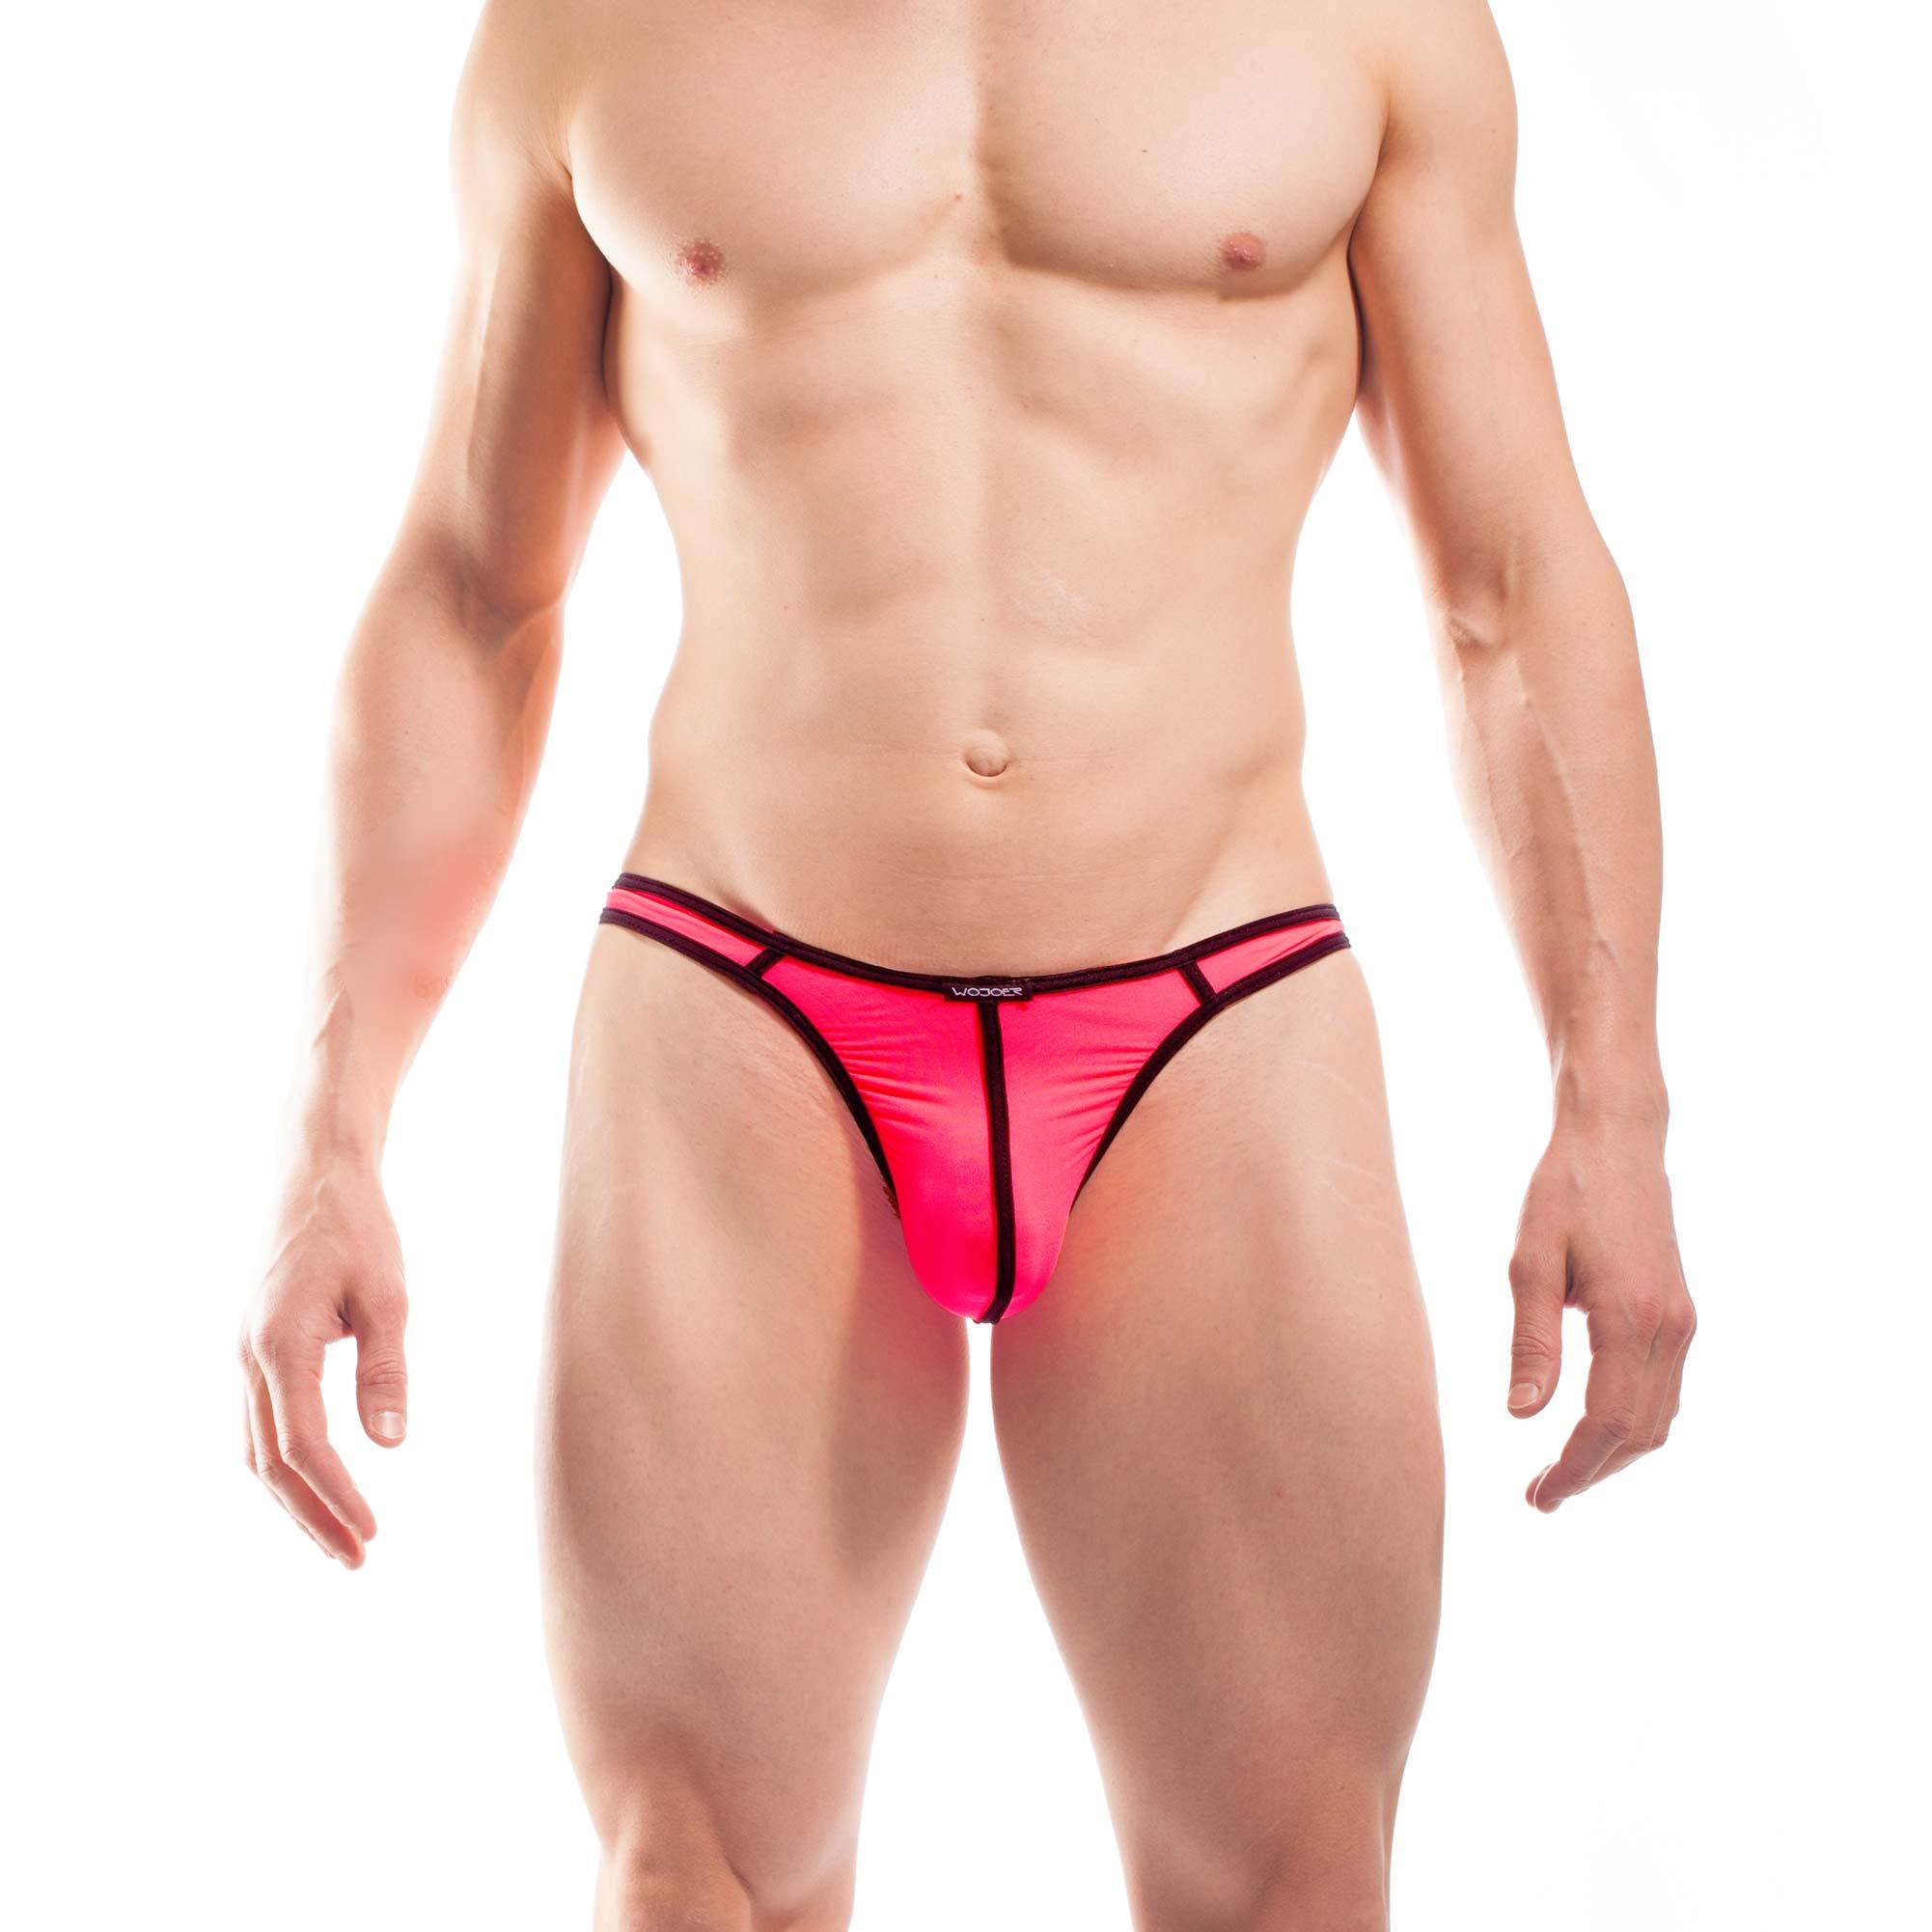 BEUN STRIPE STRING, Schmalissimo, string, knappe Badehose, swim trunks, kontrast Ränder, schwarze Börtchen, neon coral, neon rot-pink